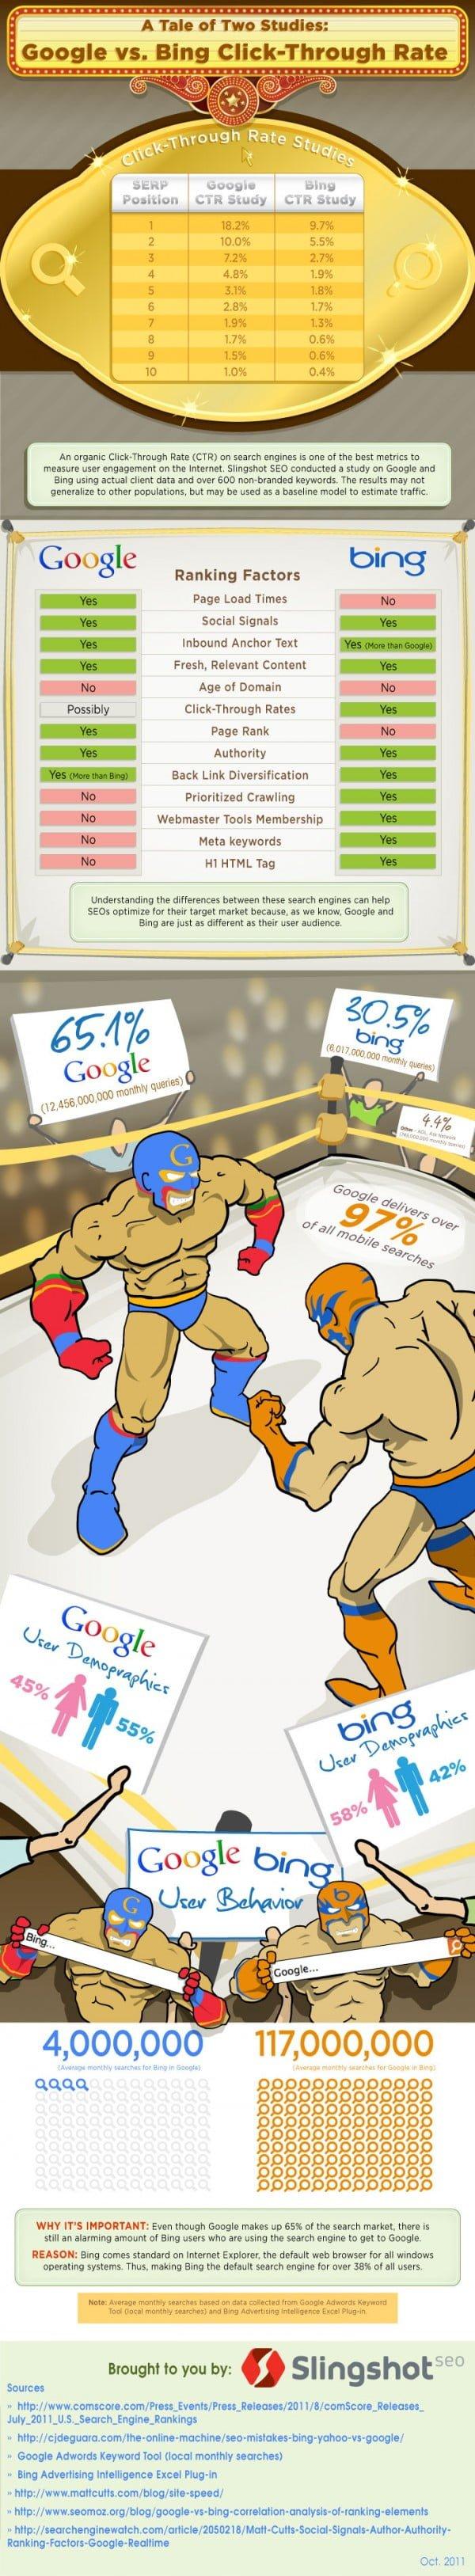 Bing-Google-CTR-Infographic-600x3254